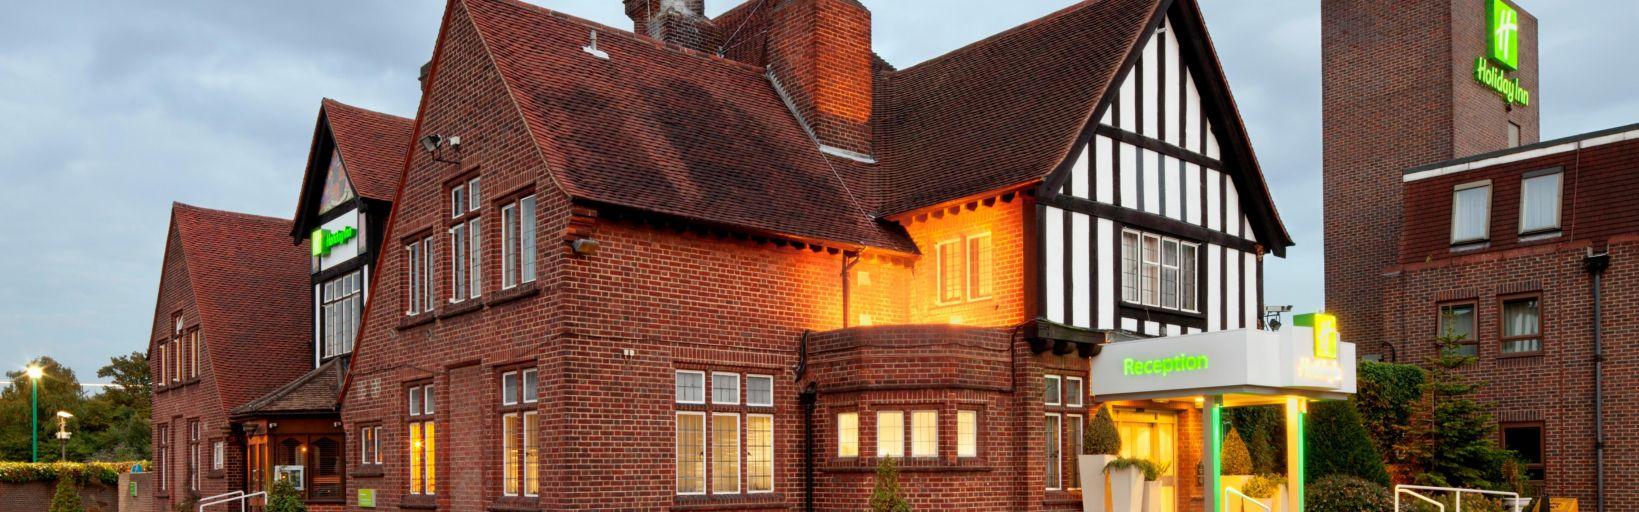 Holdiay Inn London bexley for hire